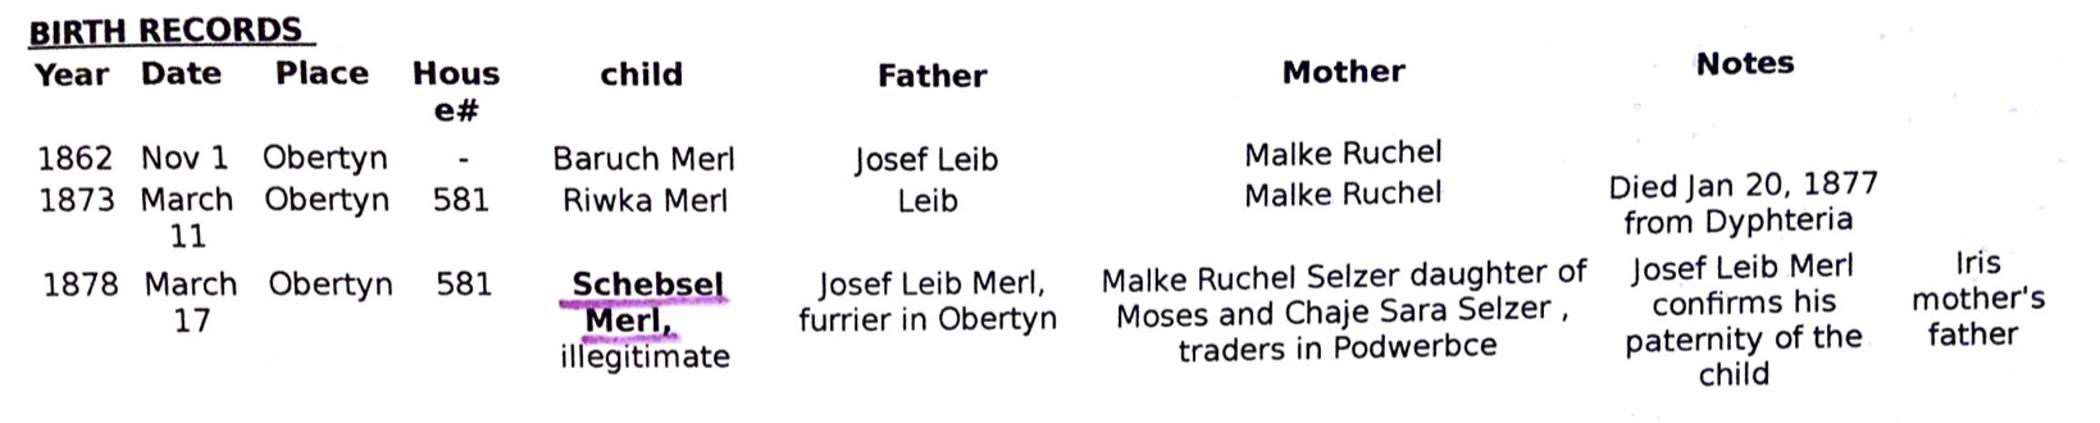 Schebsel's Birth Record